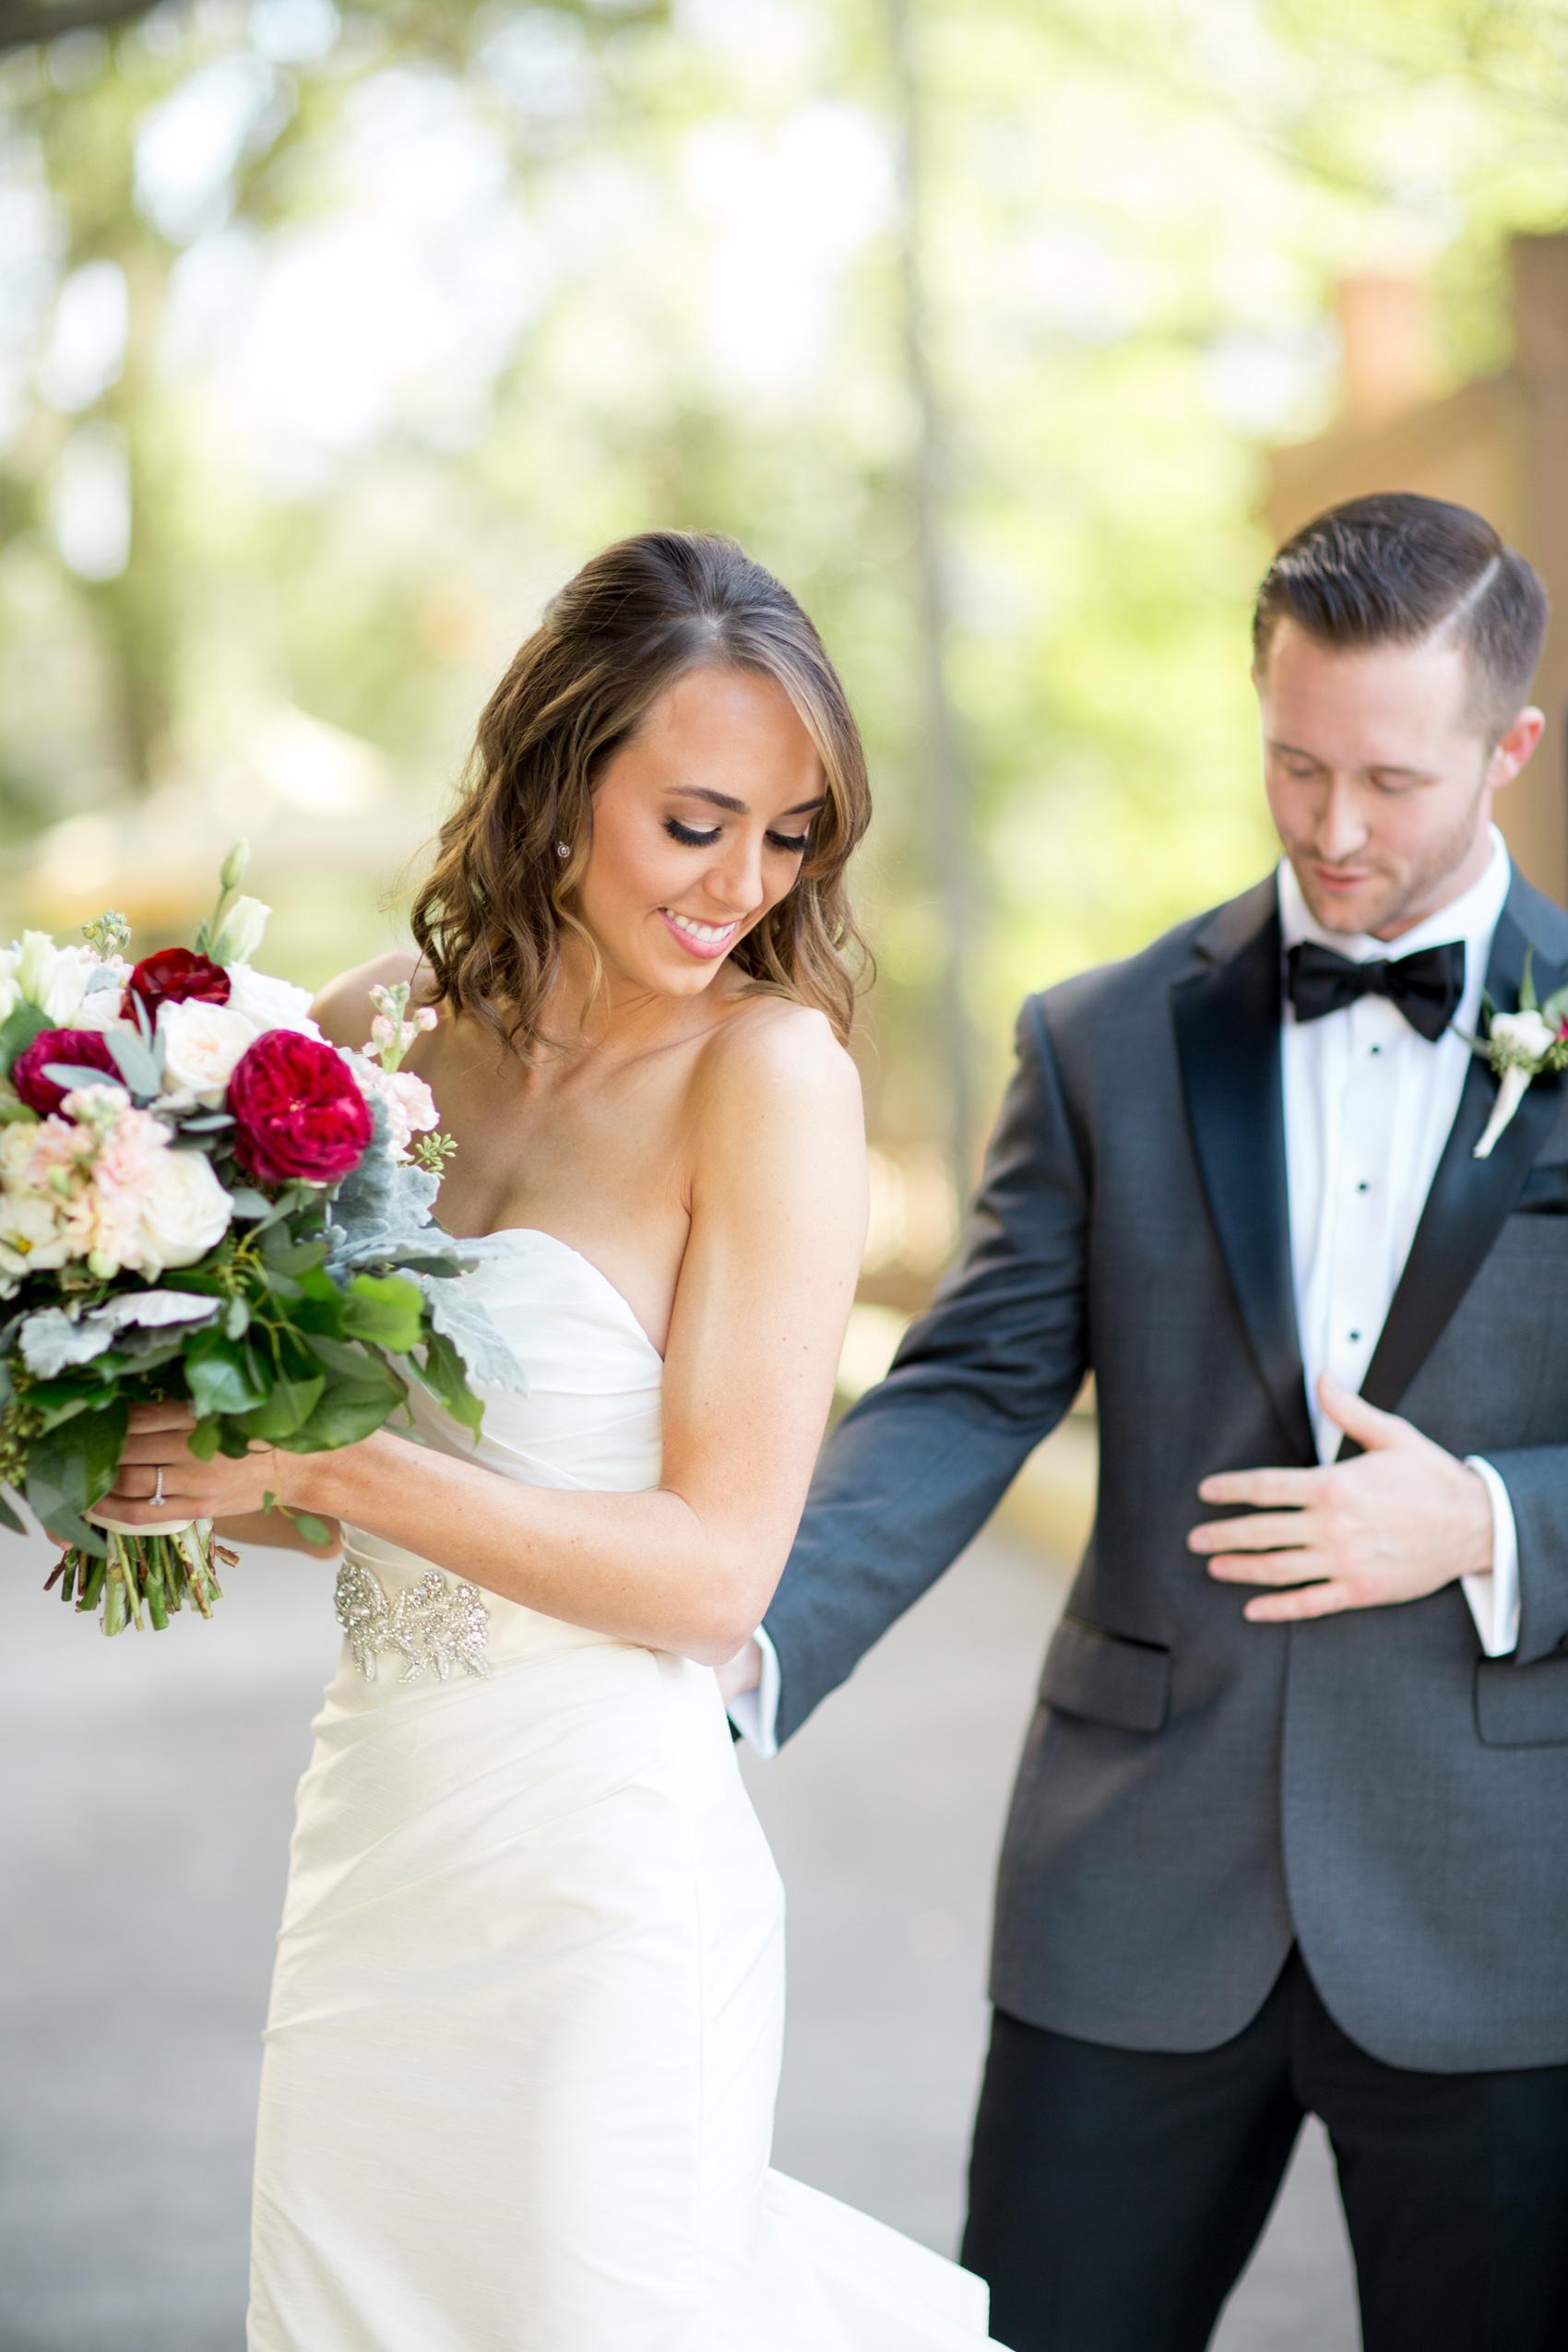 Erin and James Wedding: Theo Milo Photography